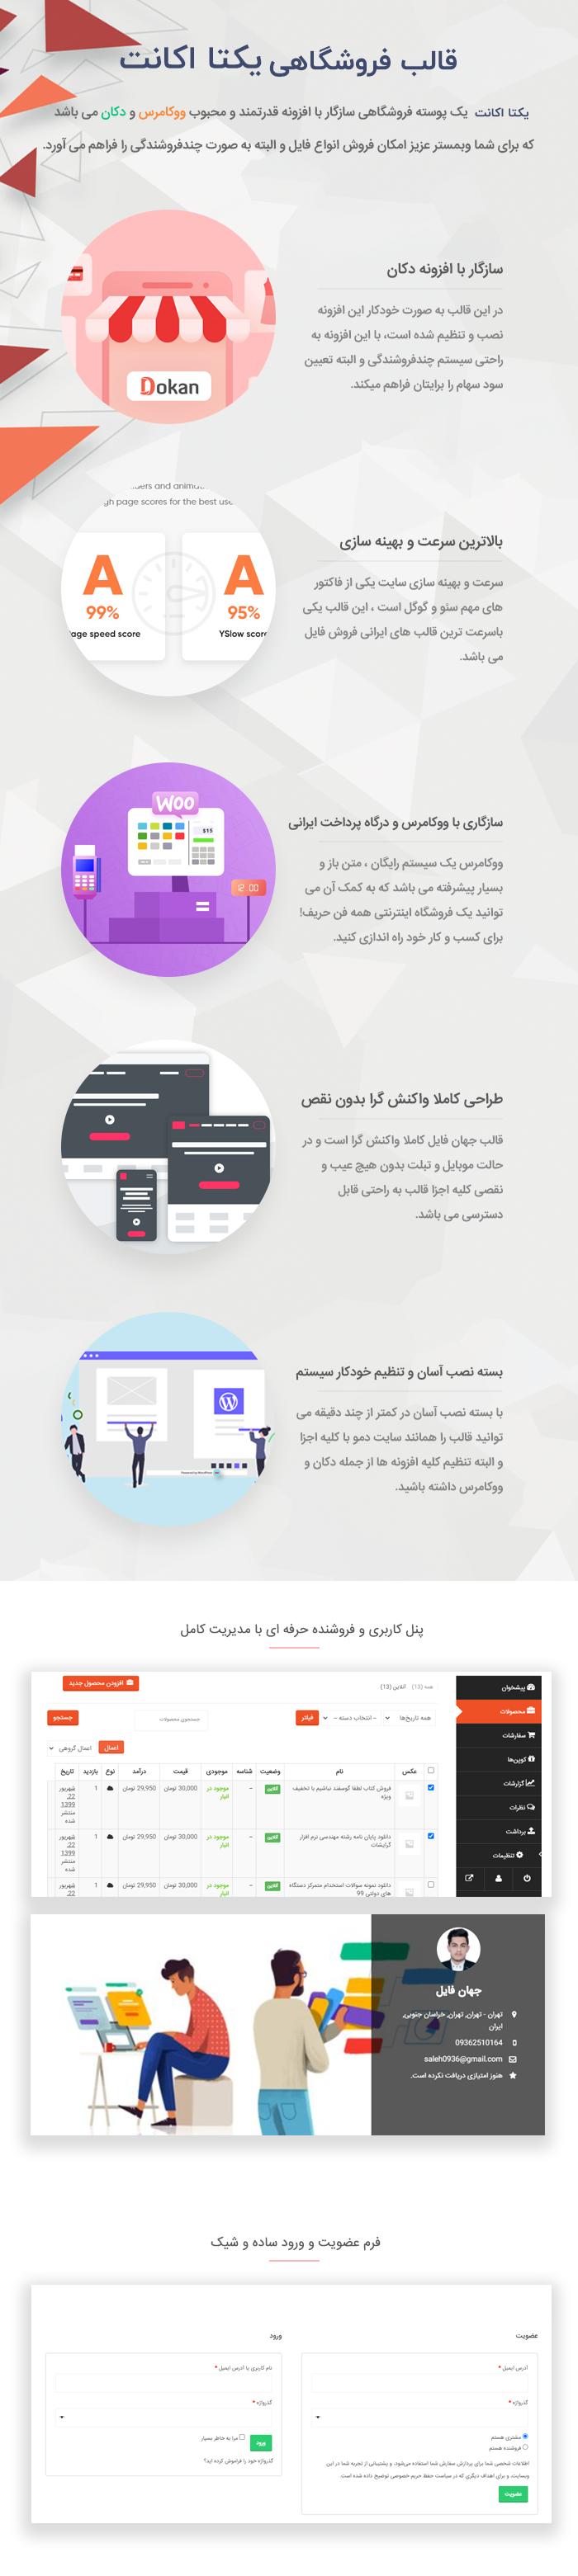 yekta account ops - قالب فروش اکانت وردپرس یکتا اکانت